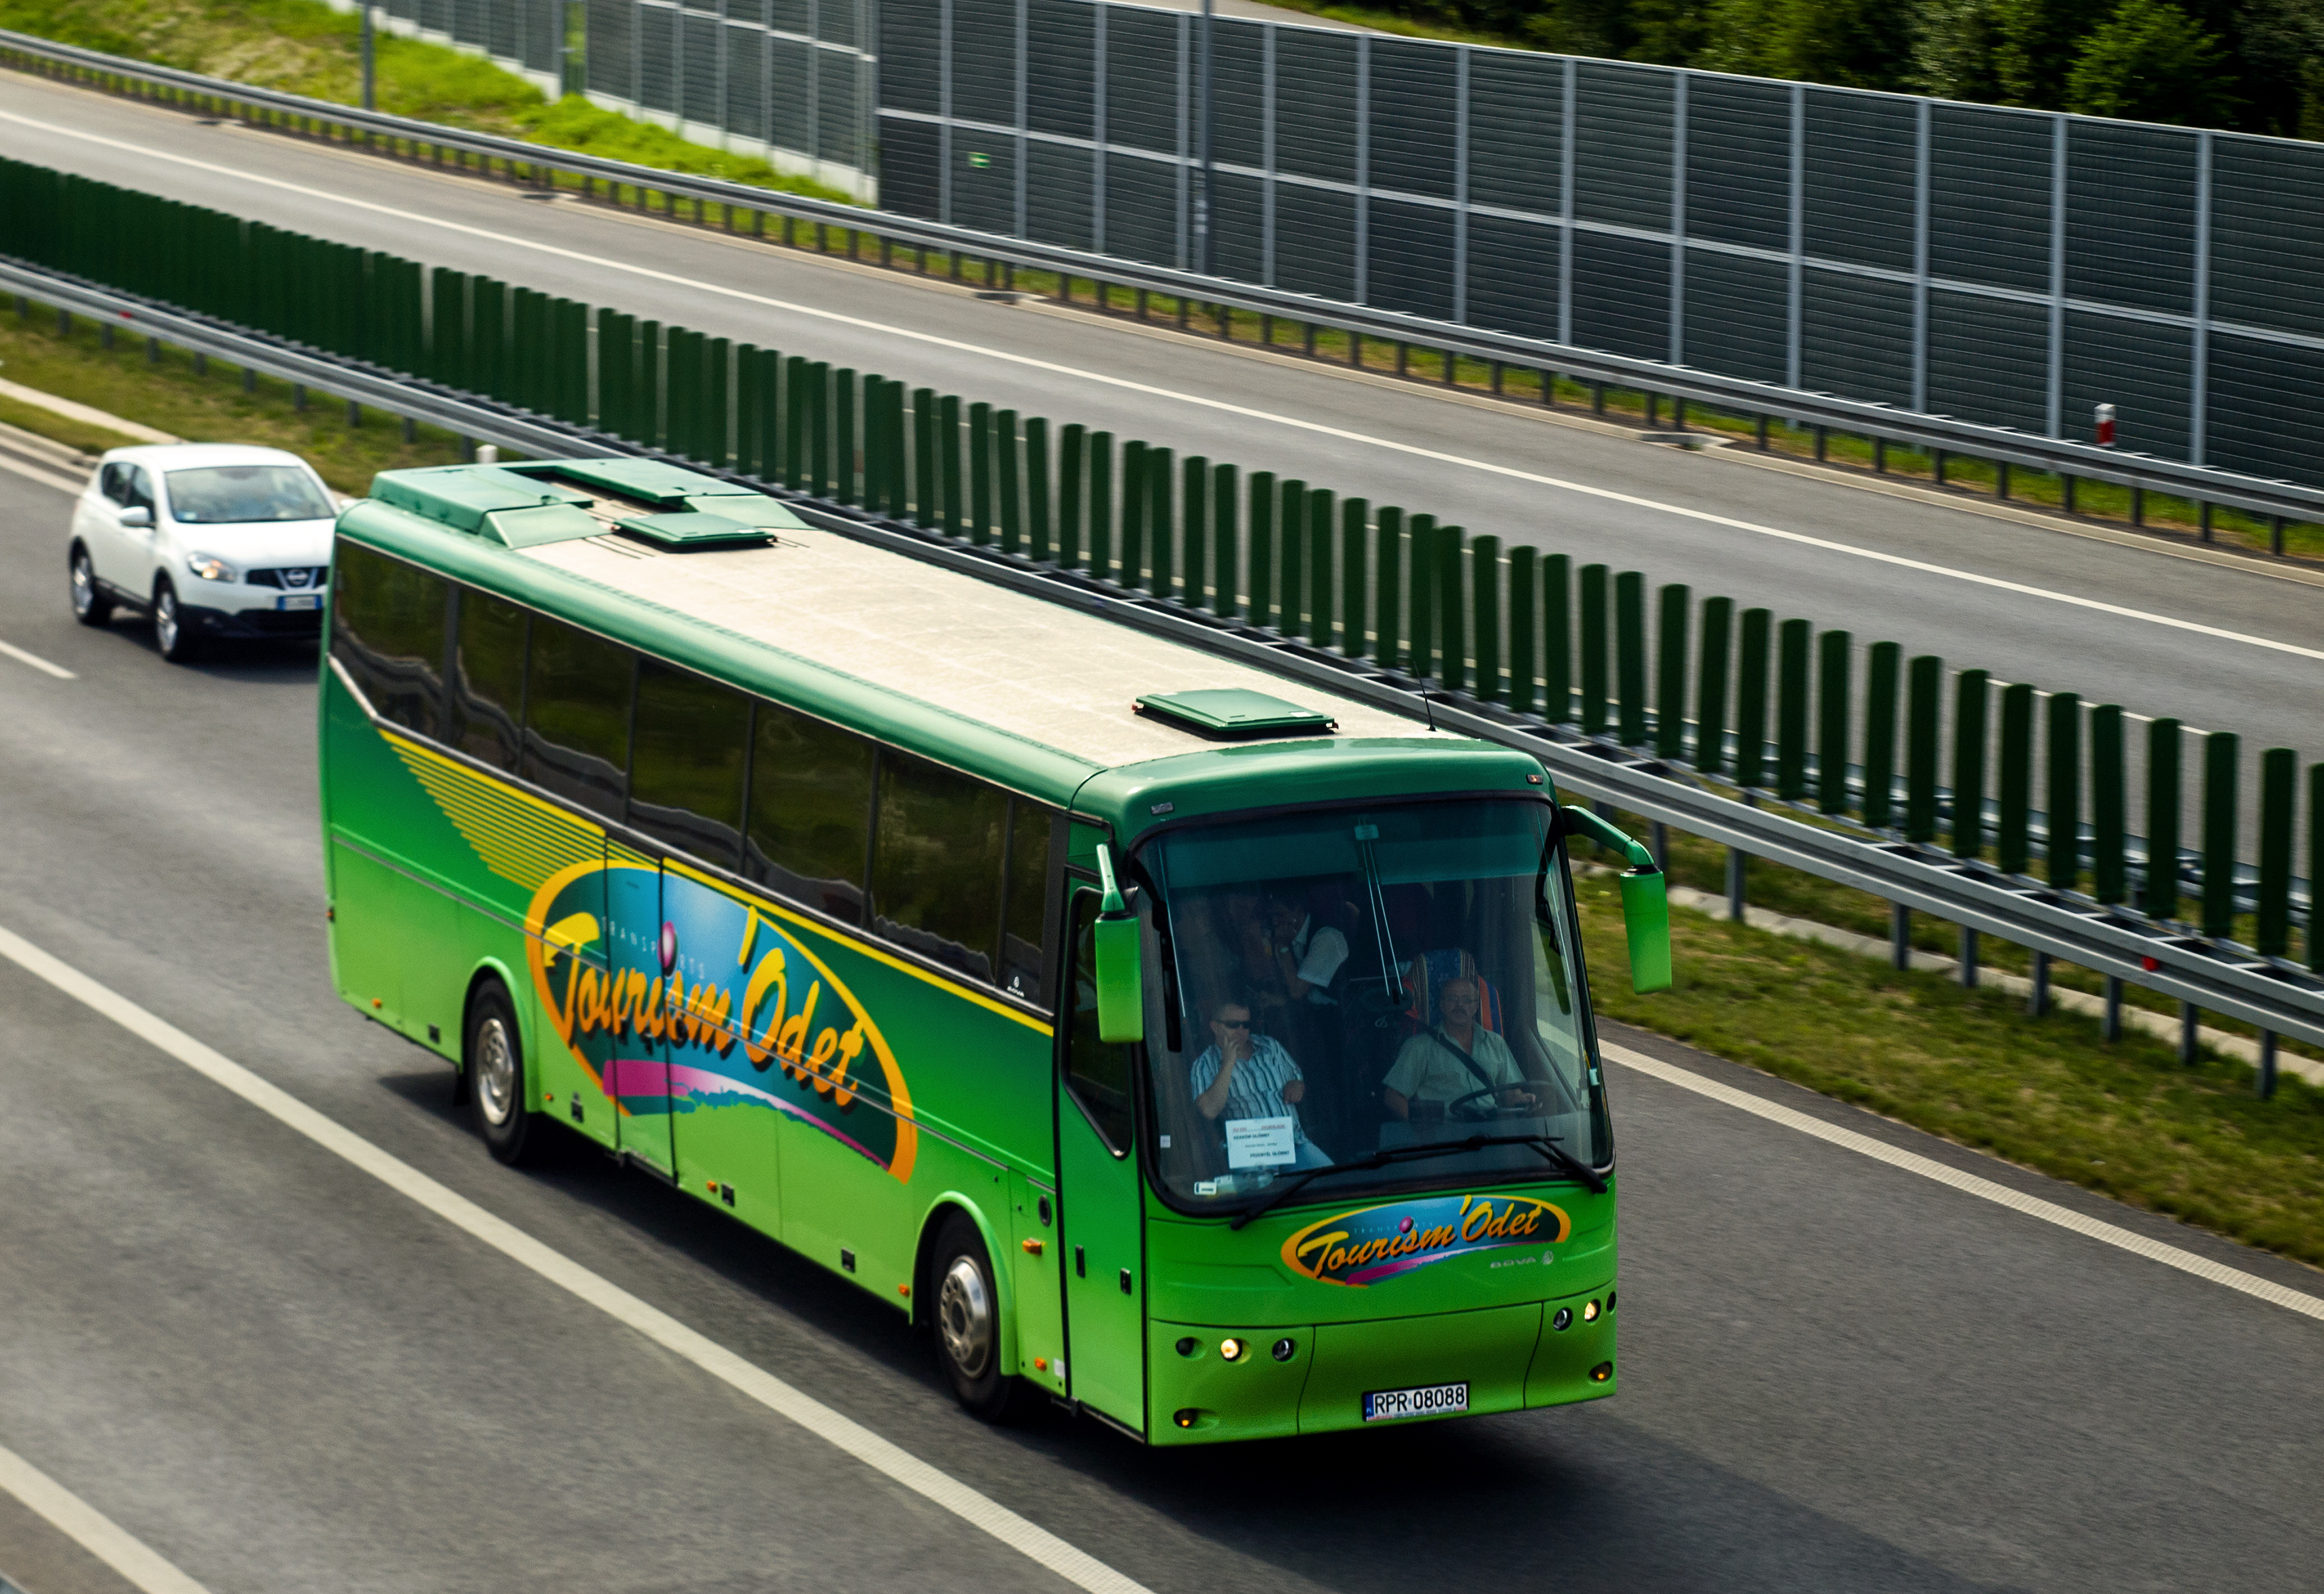 Coach Bova Futura, Public, Transport, Futura, Coach, HQ Photo